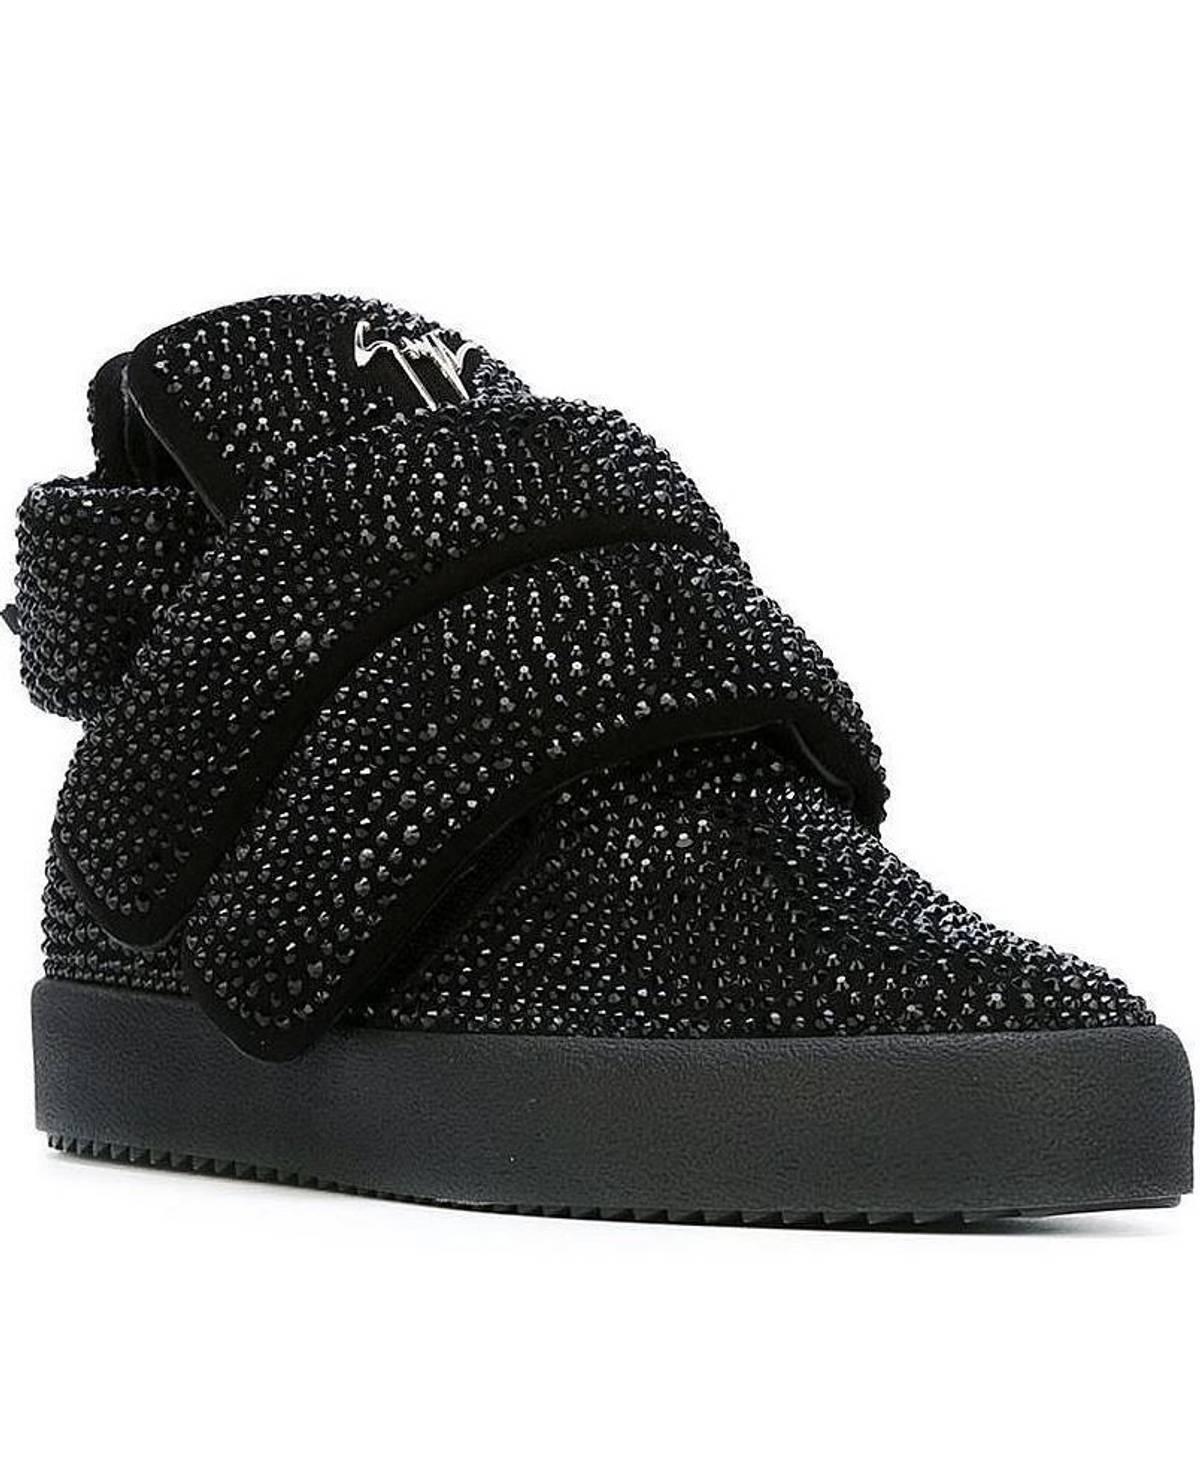 official photos cec65 9b93b Giuseppe Zanotti $2395 Authentic Rare Giuseppe Zanotti Yeezy Men's High Top  Fashion Sneakers Size 8 $1100